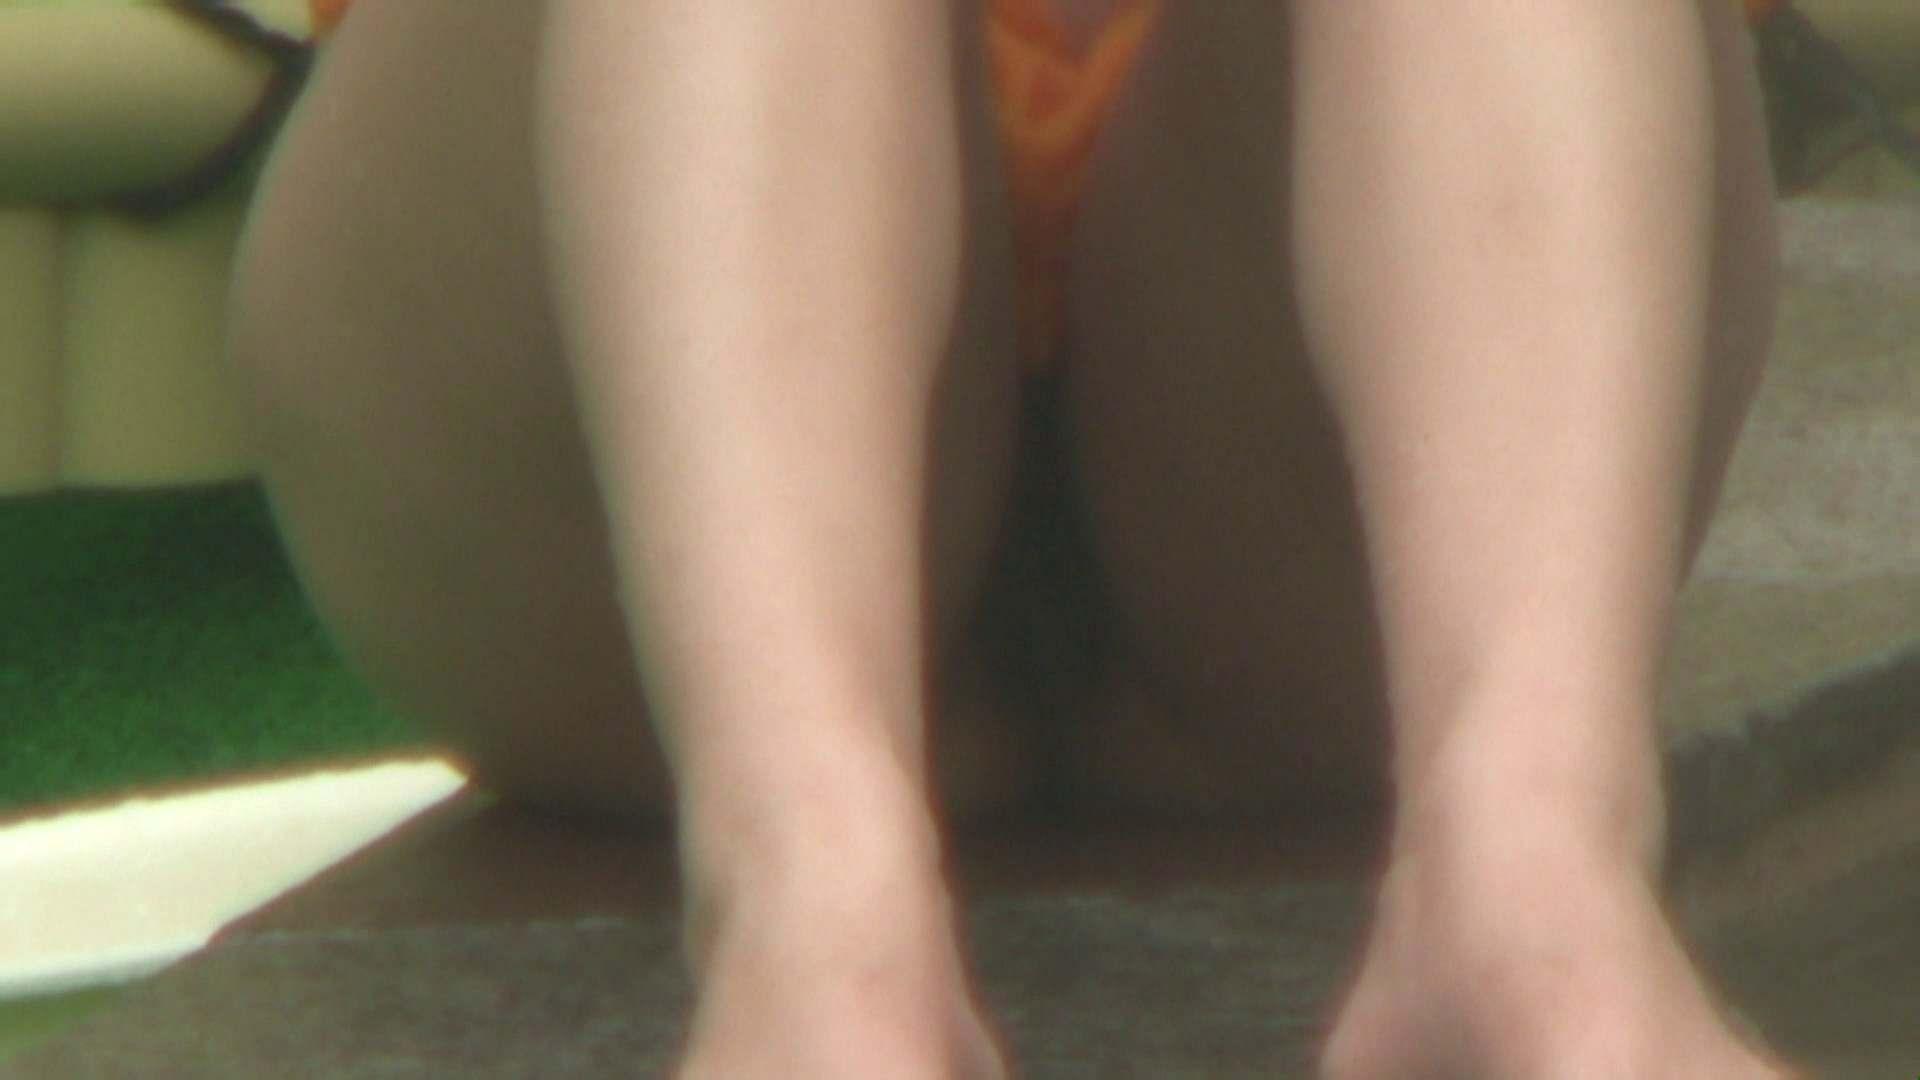 Aquaな露天風呂Vol.74【VIP限定】 OLセックス | 露天  68画像 34